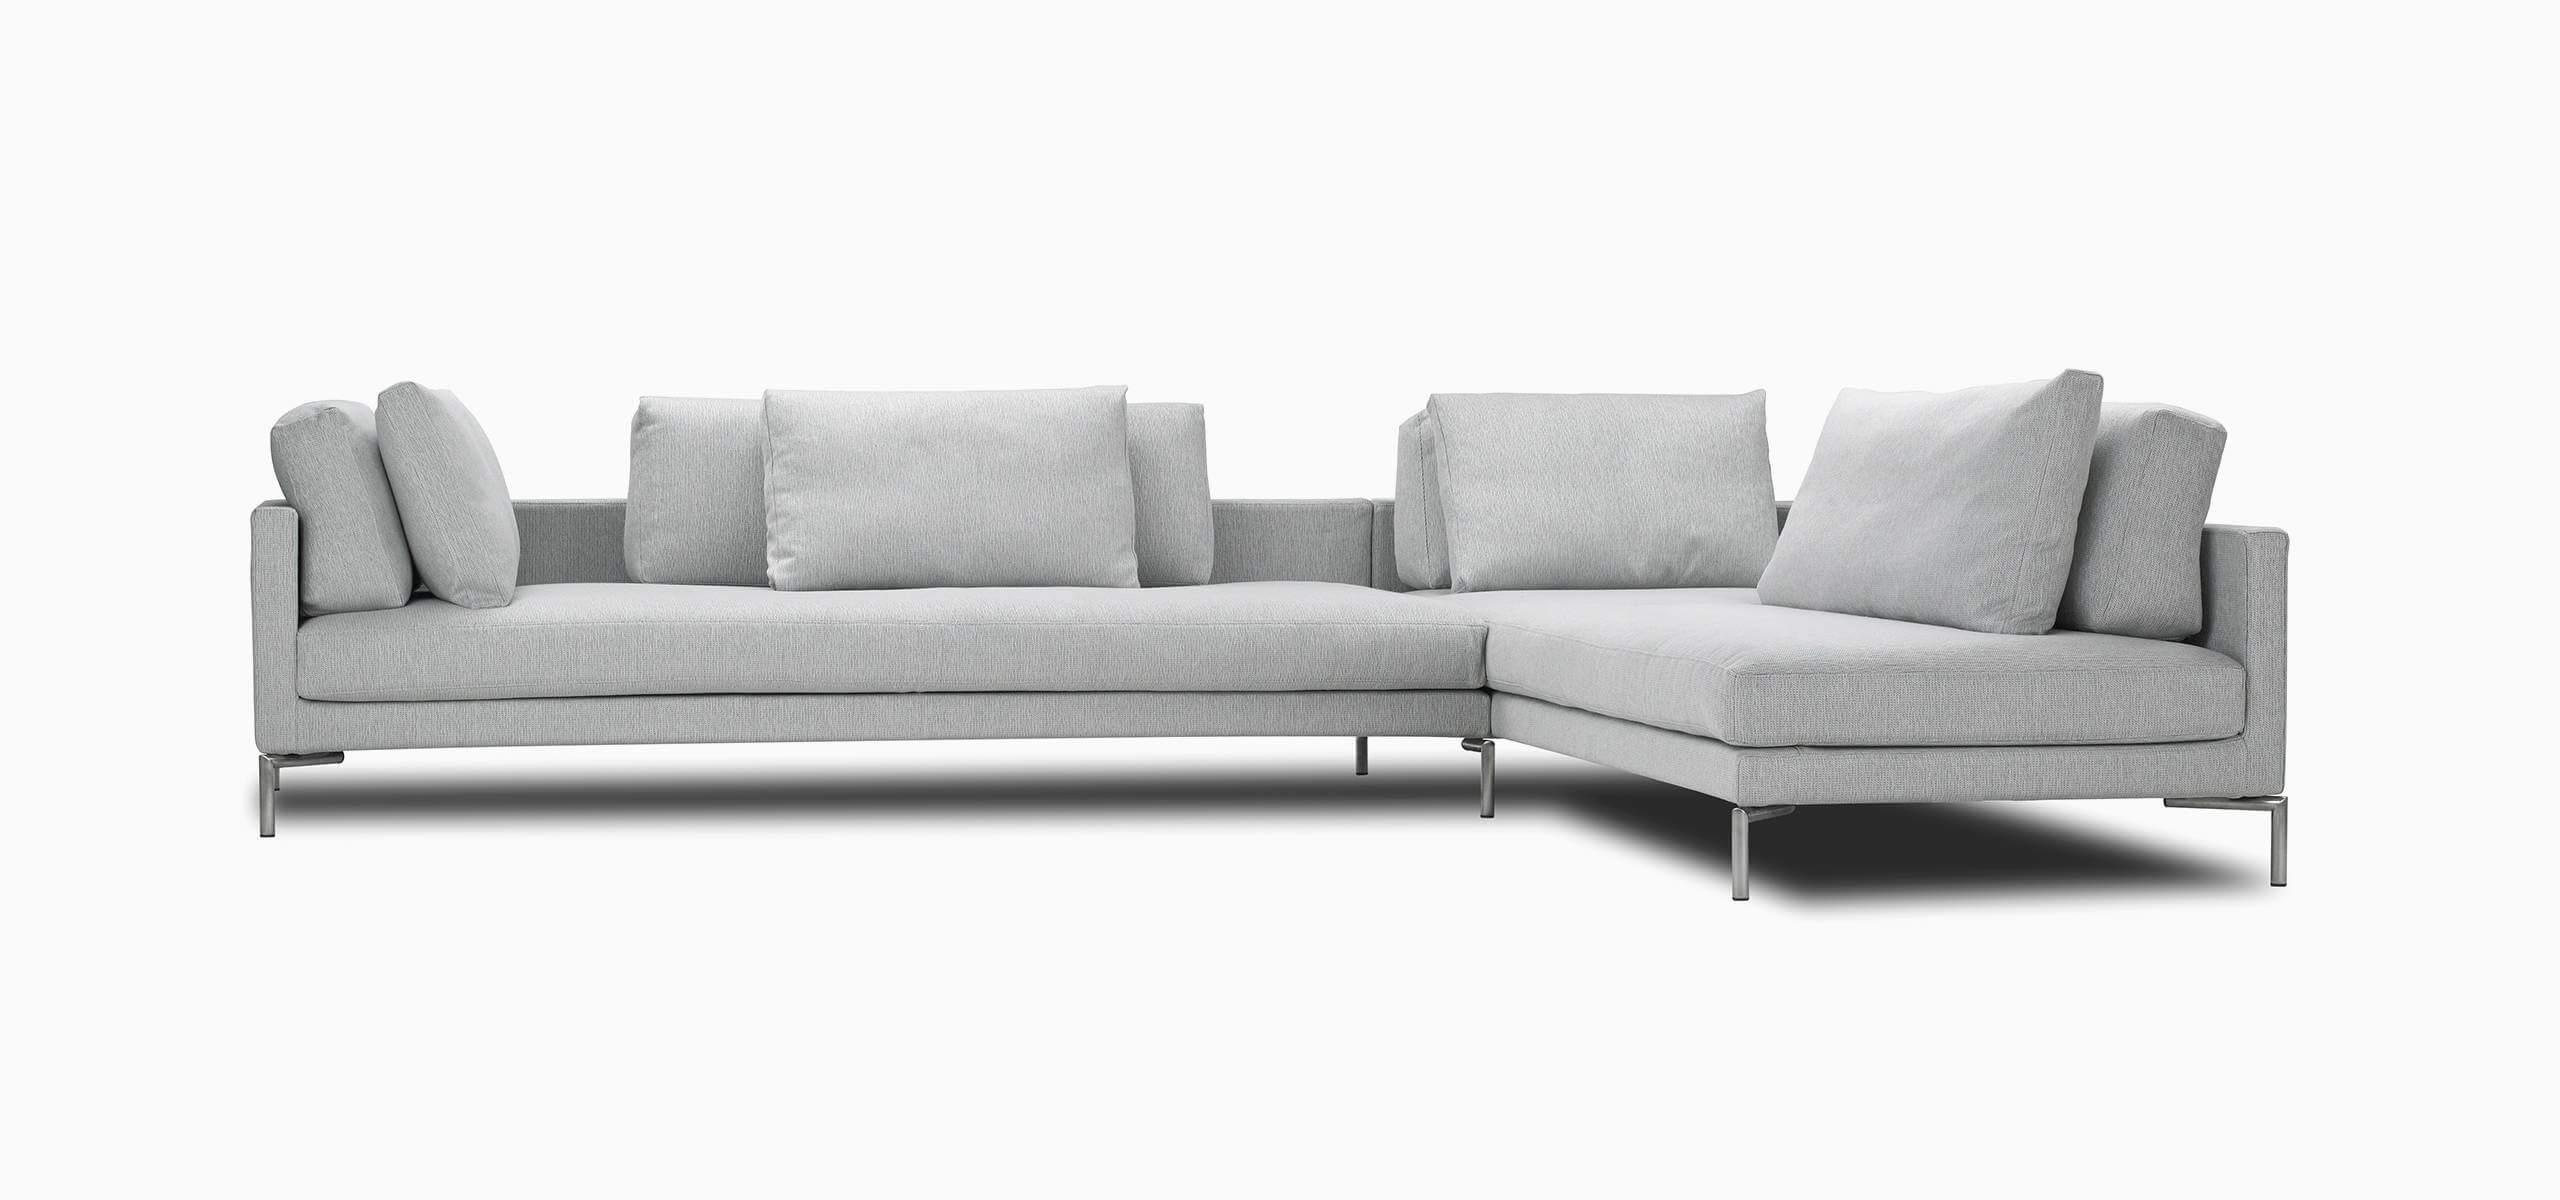 cat tunnel sofa price la z boy tamla 2 seater power recliner eilersen denmark tub 36